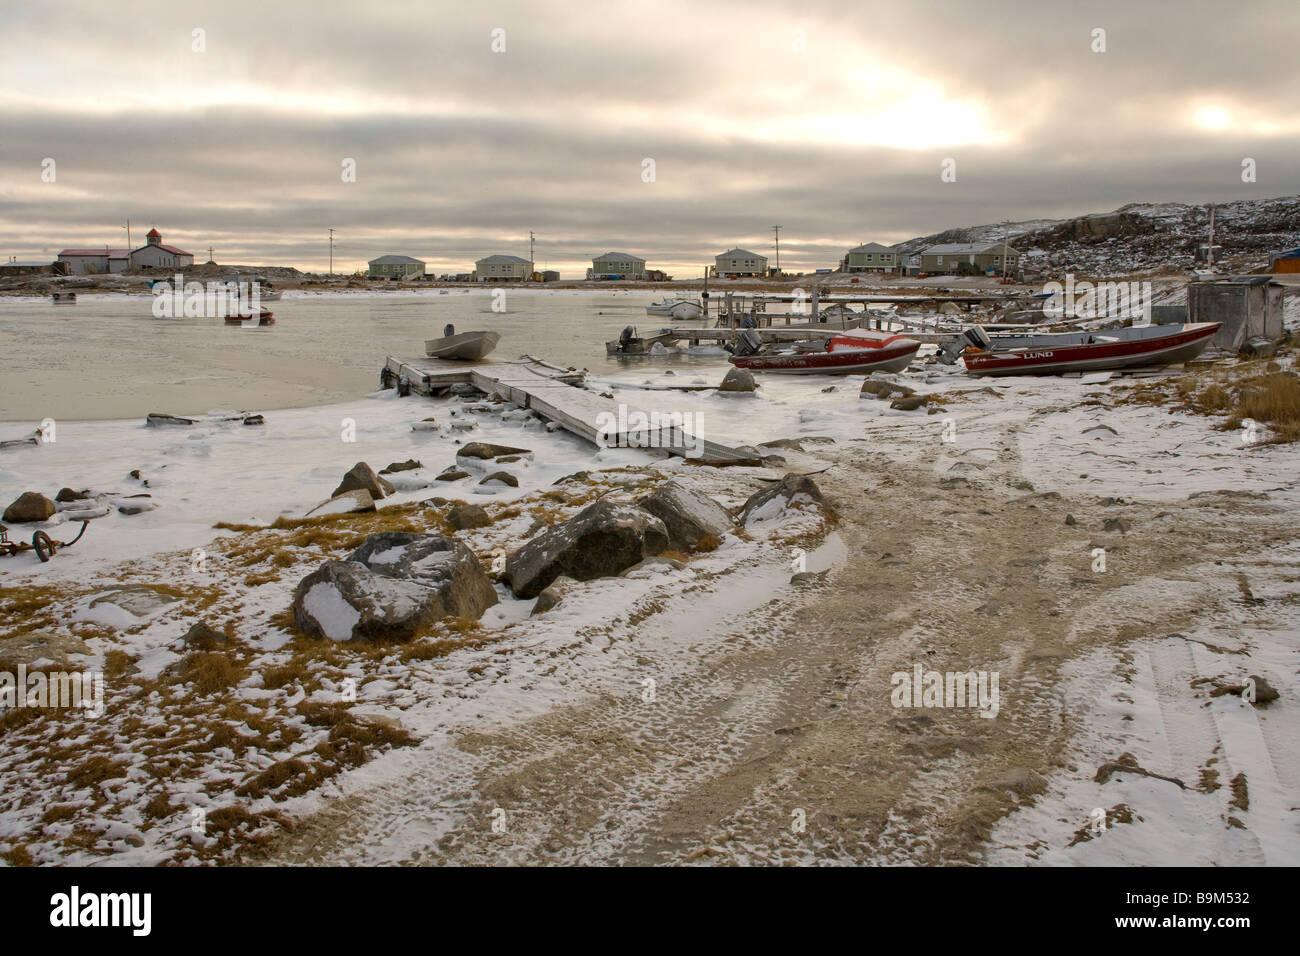 Boats in harbour at Taloyoak inuit settlement Nunavut, sunset, Canadian arctic, Canada - Stock Image